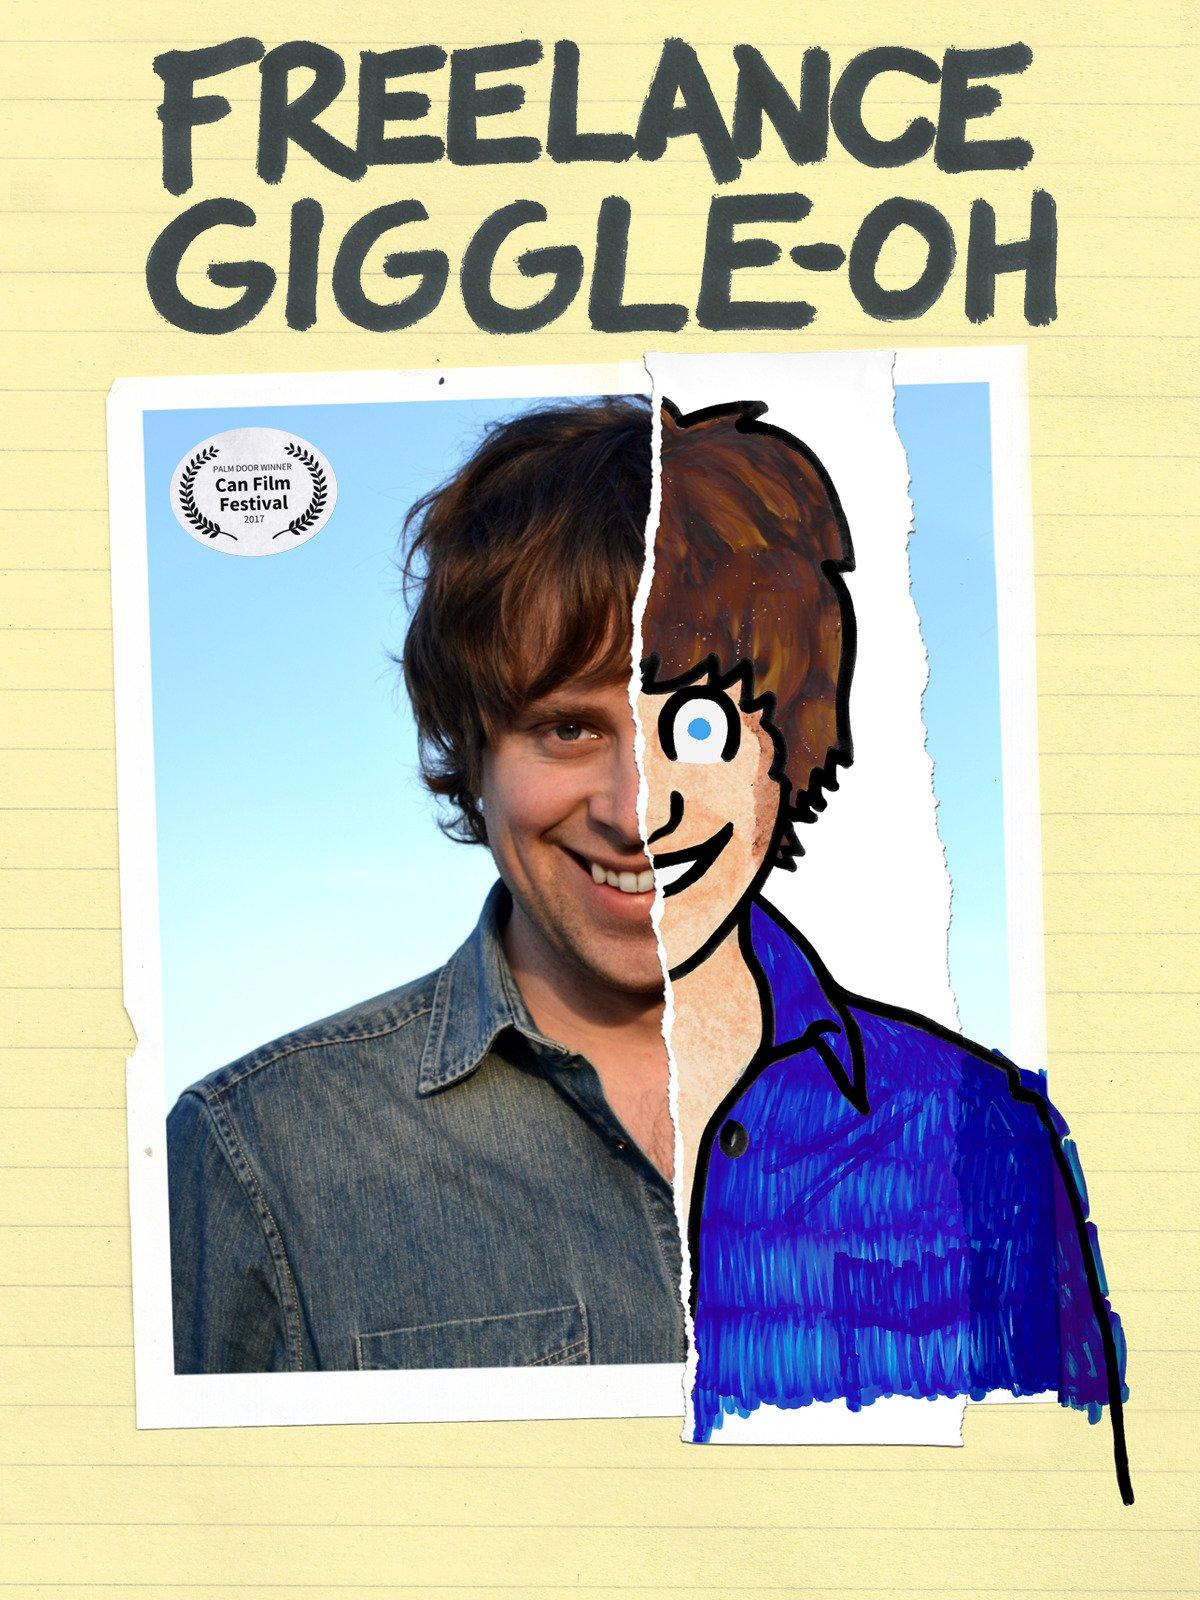 Freelance Giggle-oh